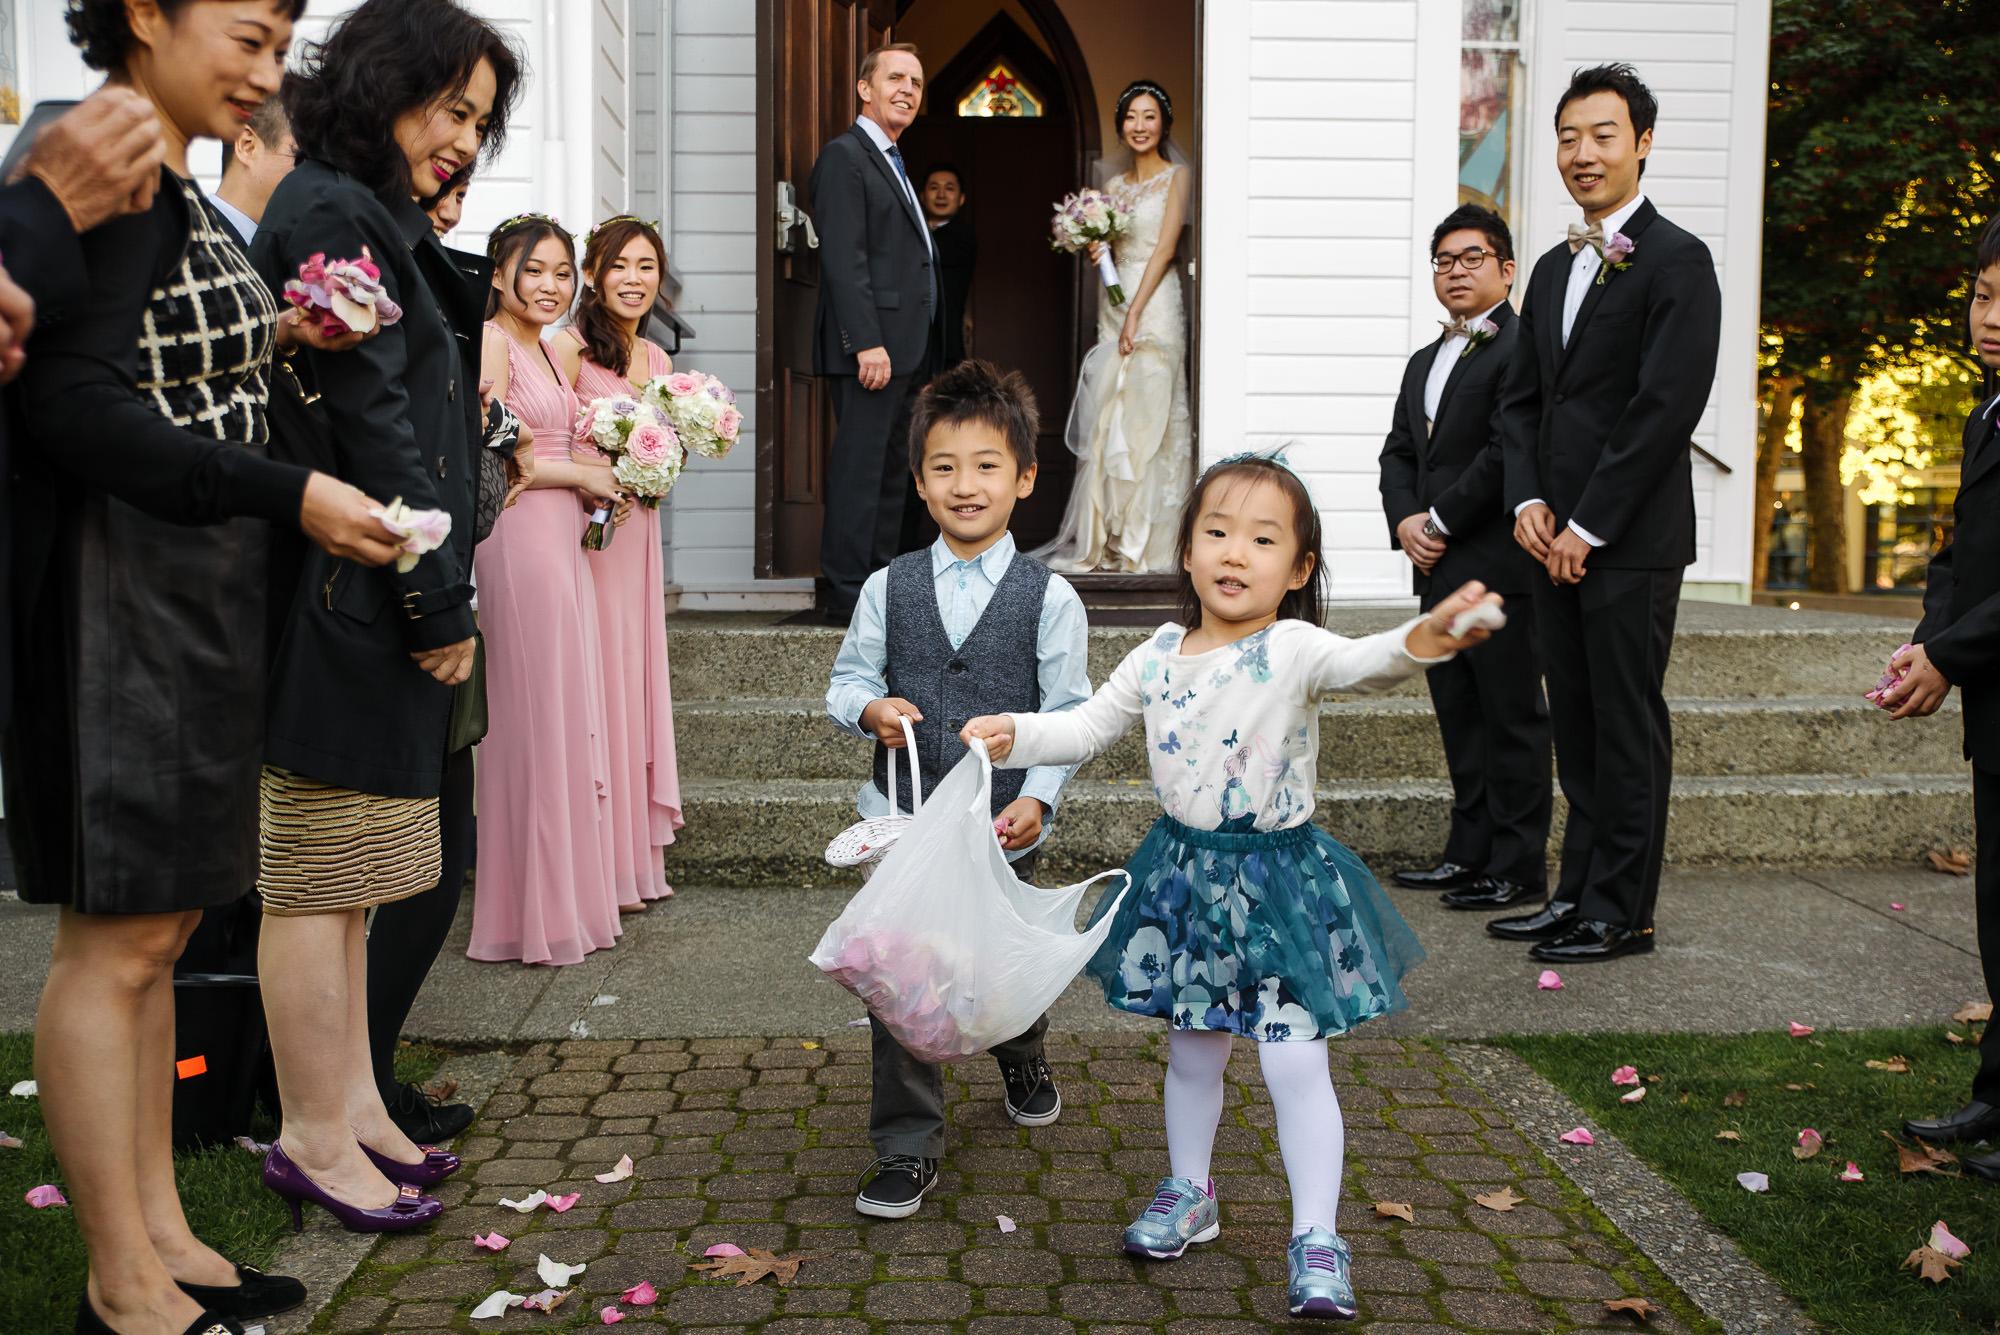 minoru_chapel_richmond_wedding_ceremony 16393414.jpg